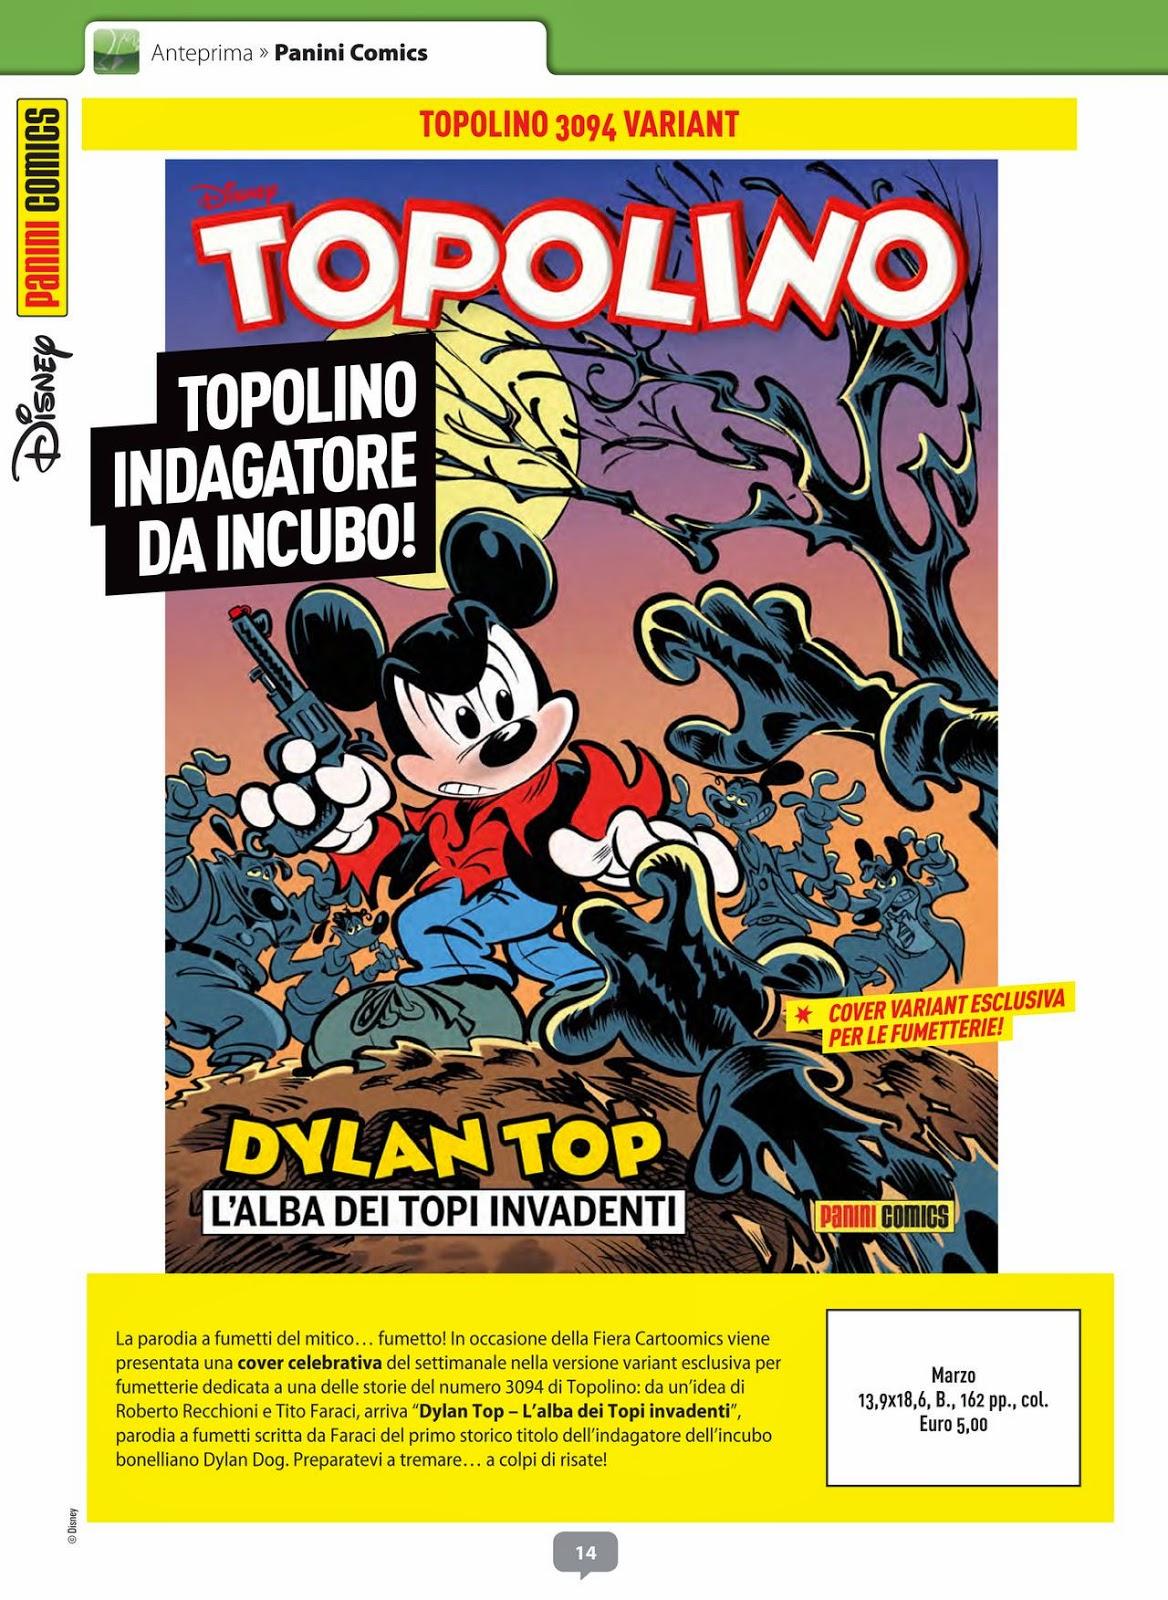 Topolino #3094 - variant cover (Anteprima #282 Febbraio 2015)